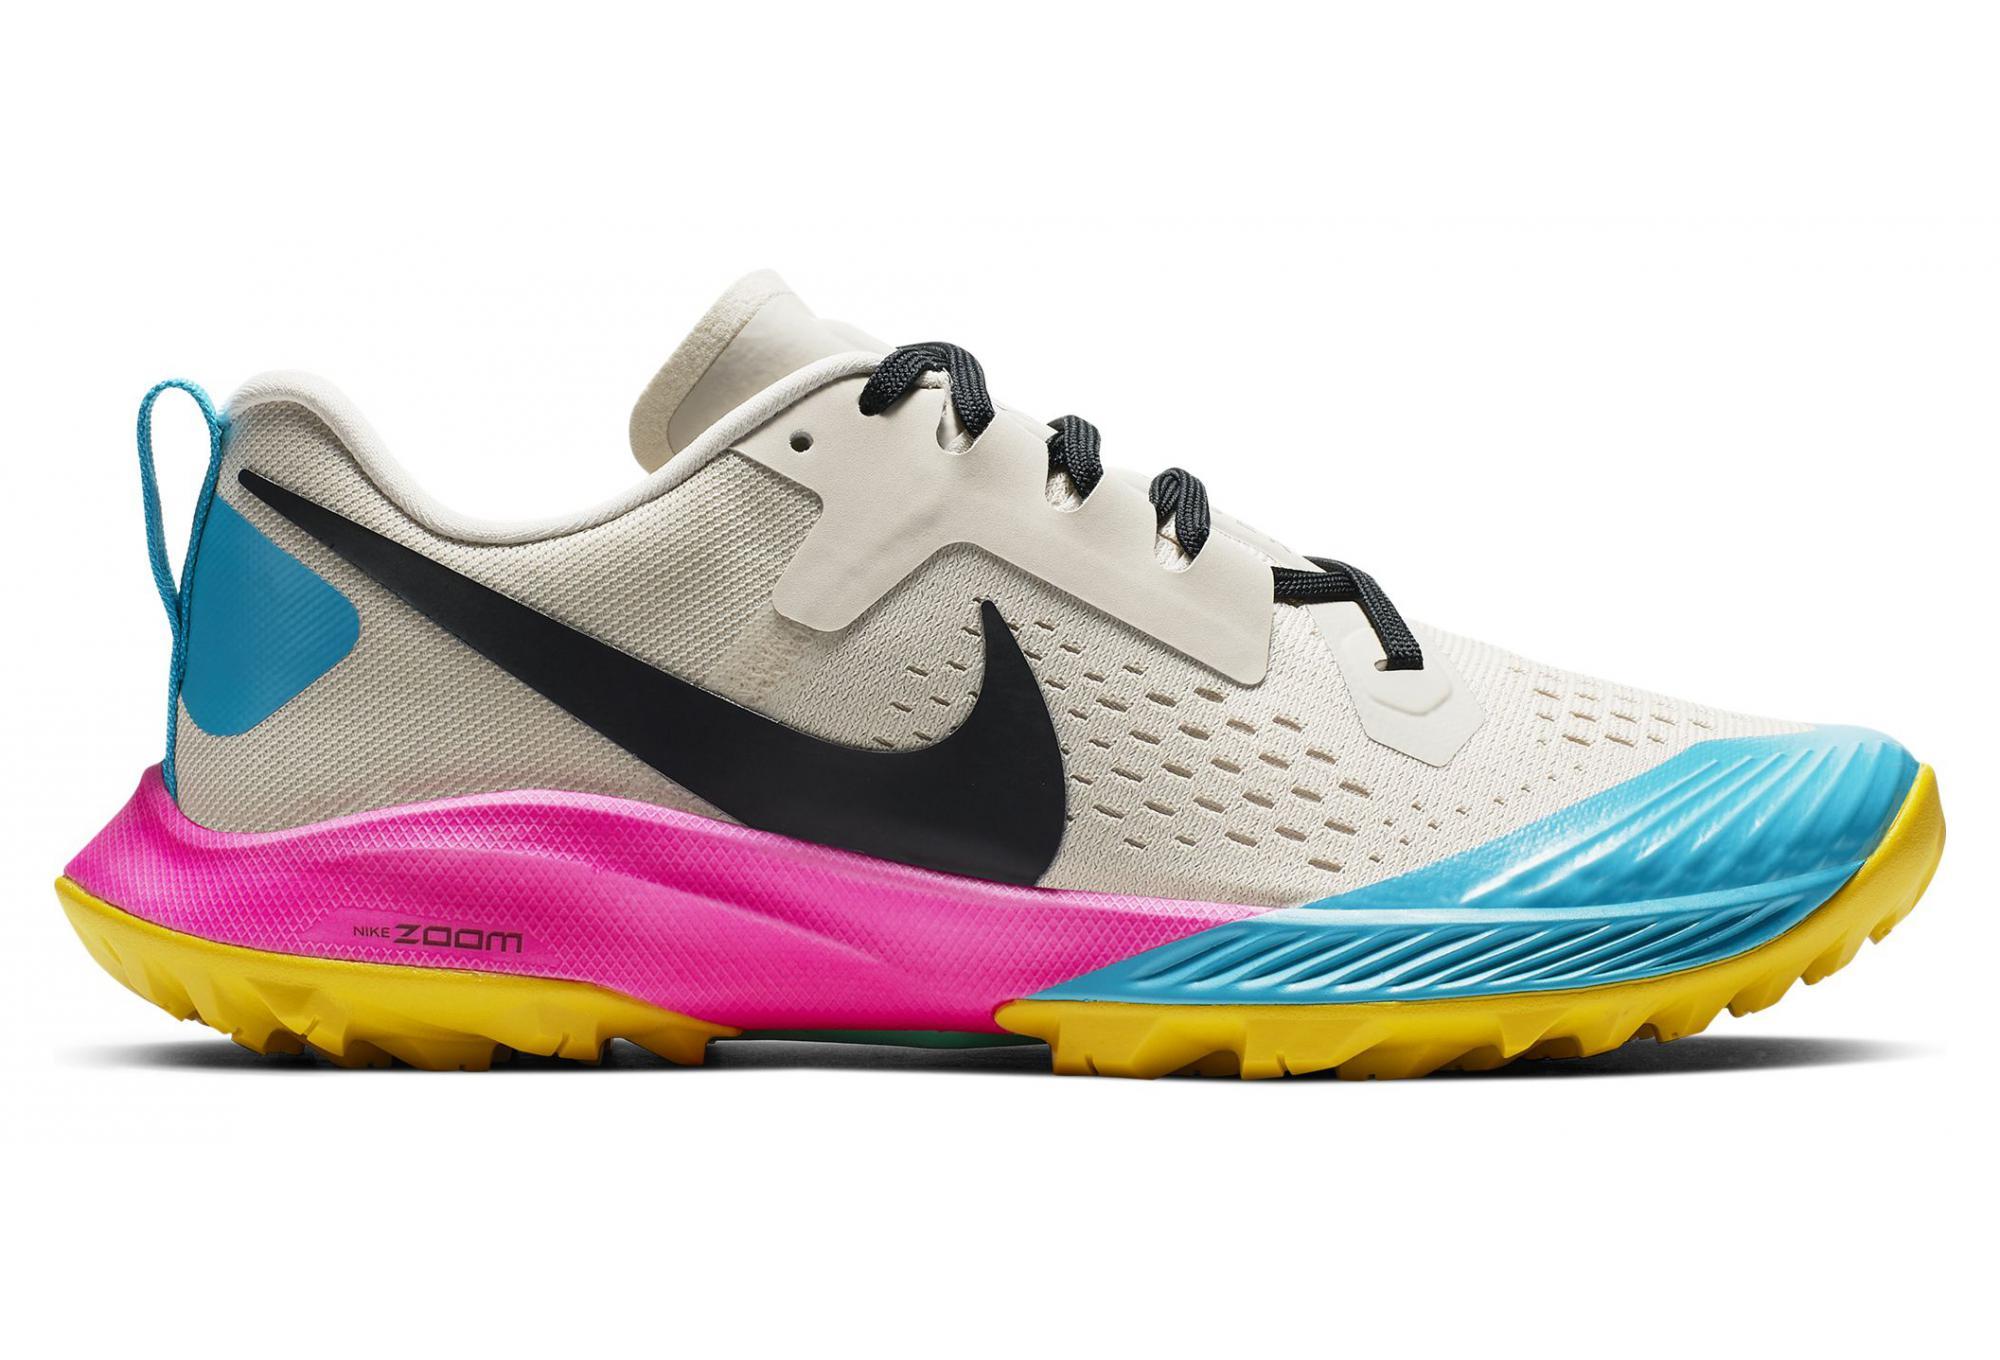 info for 792c8 4c3f9 Chaussures de Trail Femme Nike Air Zoom Terra Kiger 5 Blanc   Bleu